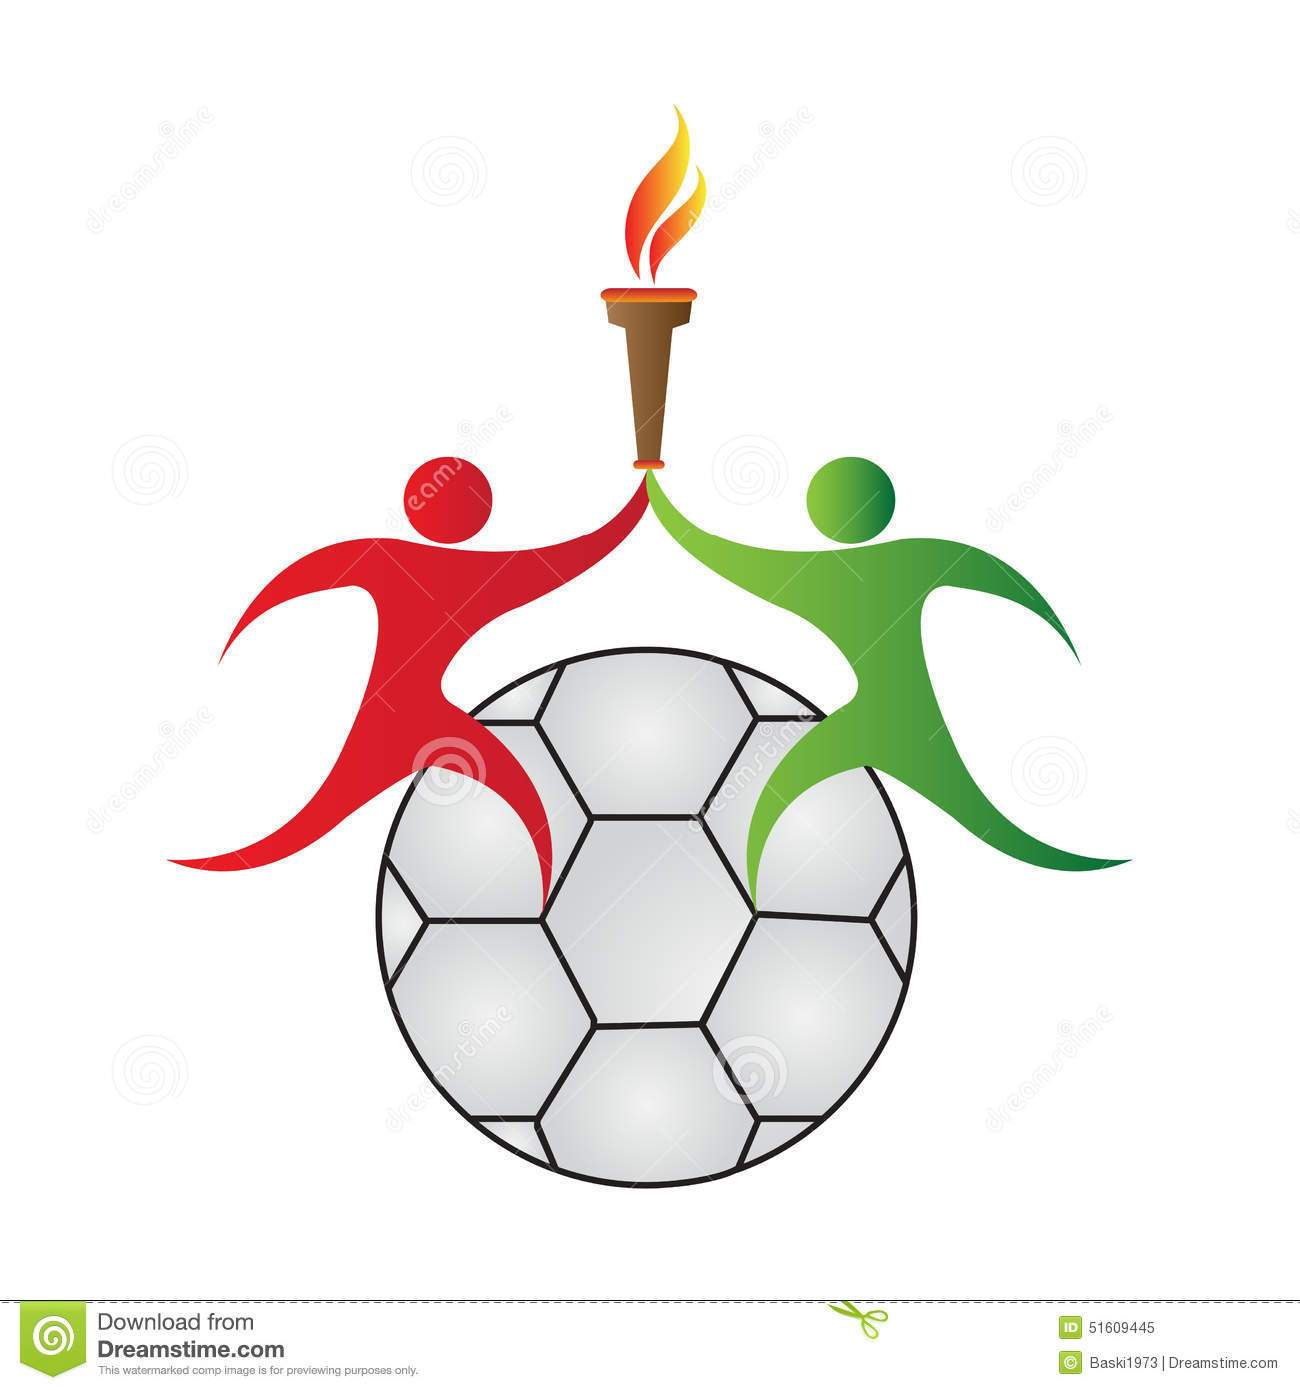 Sports logo clipart 5 » Clipart Portal.